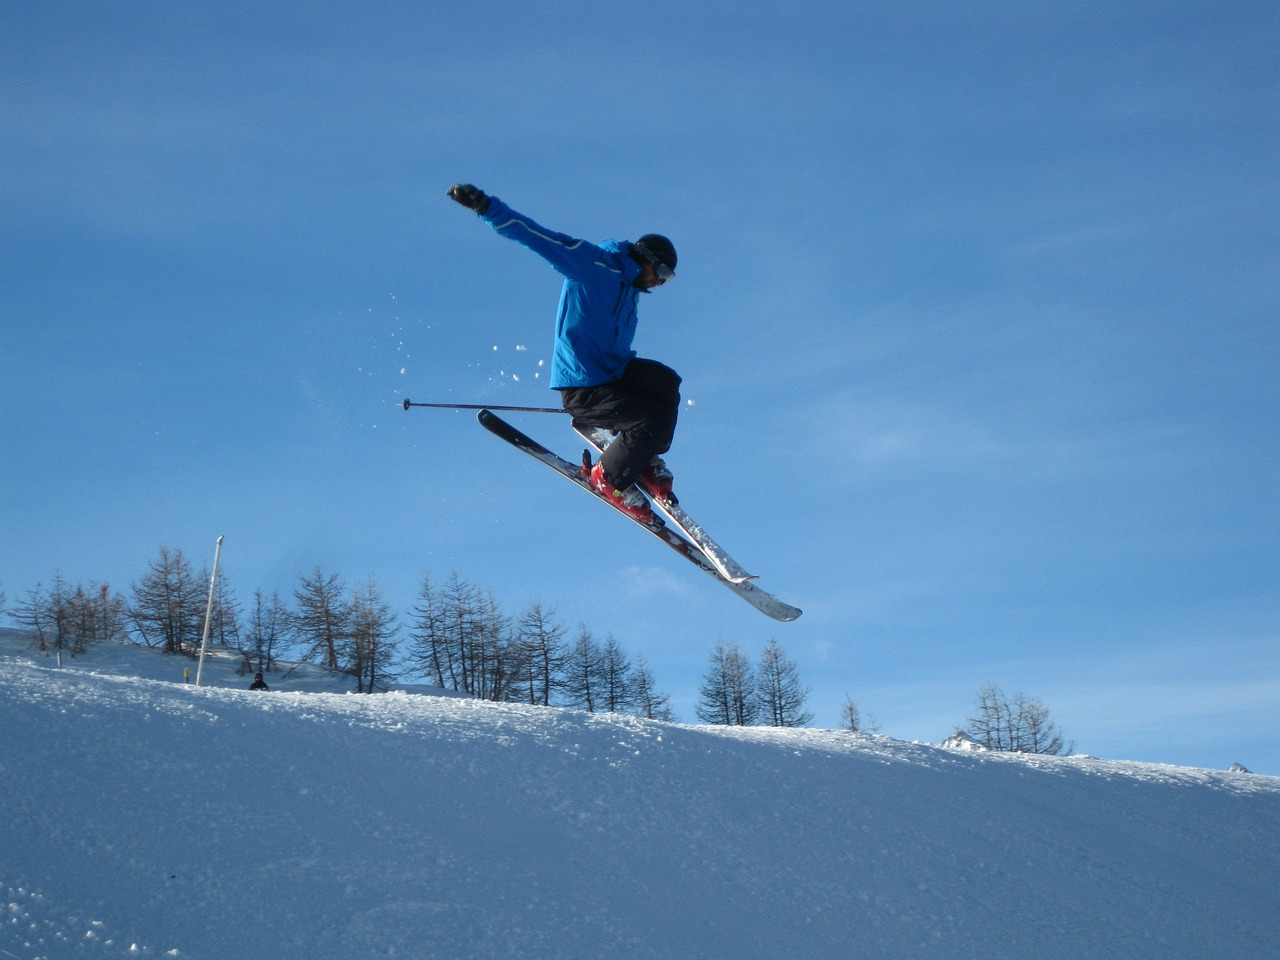 Esquiadores: No esperéis hasta fin de año y volver a esquiar hoy 2